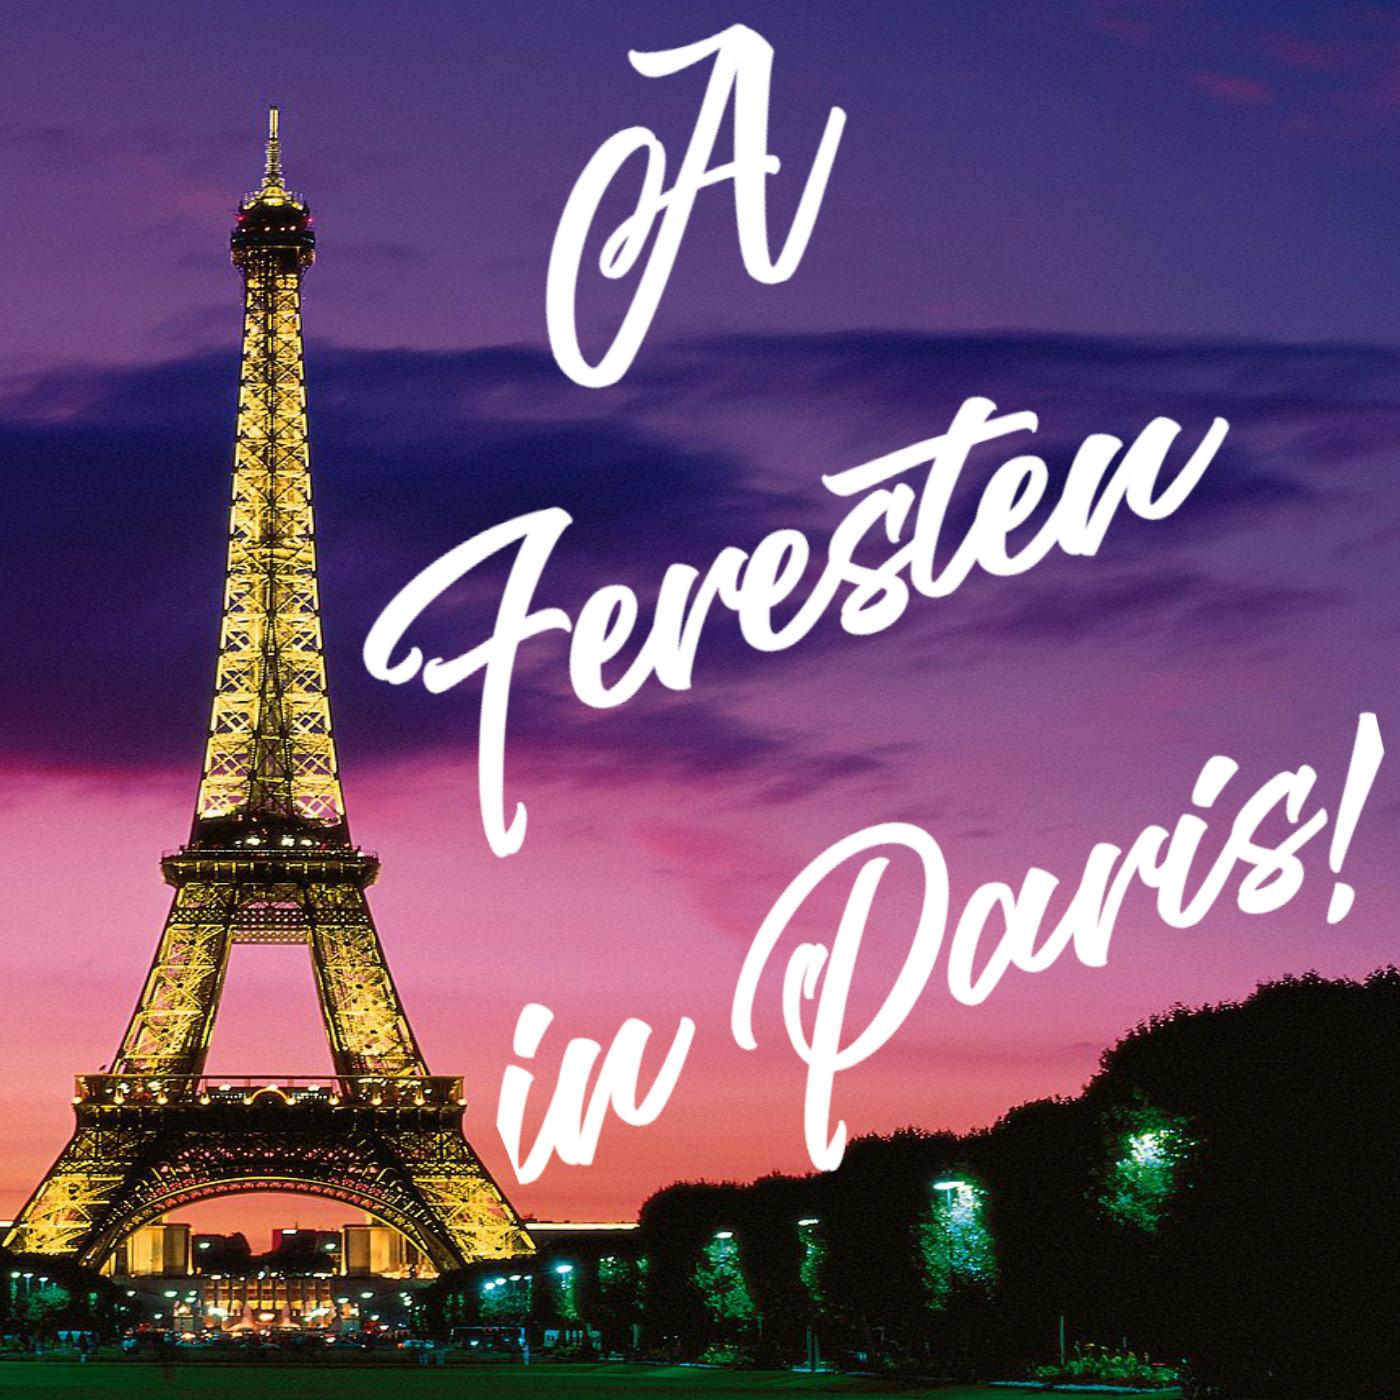 S6:E7 - A Feresten in Paris